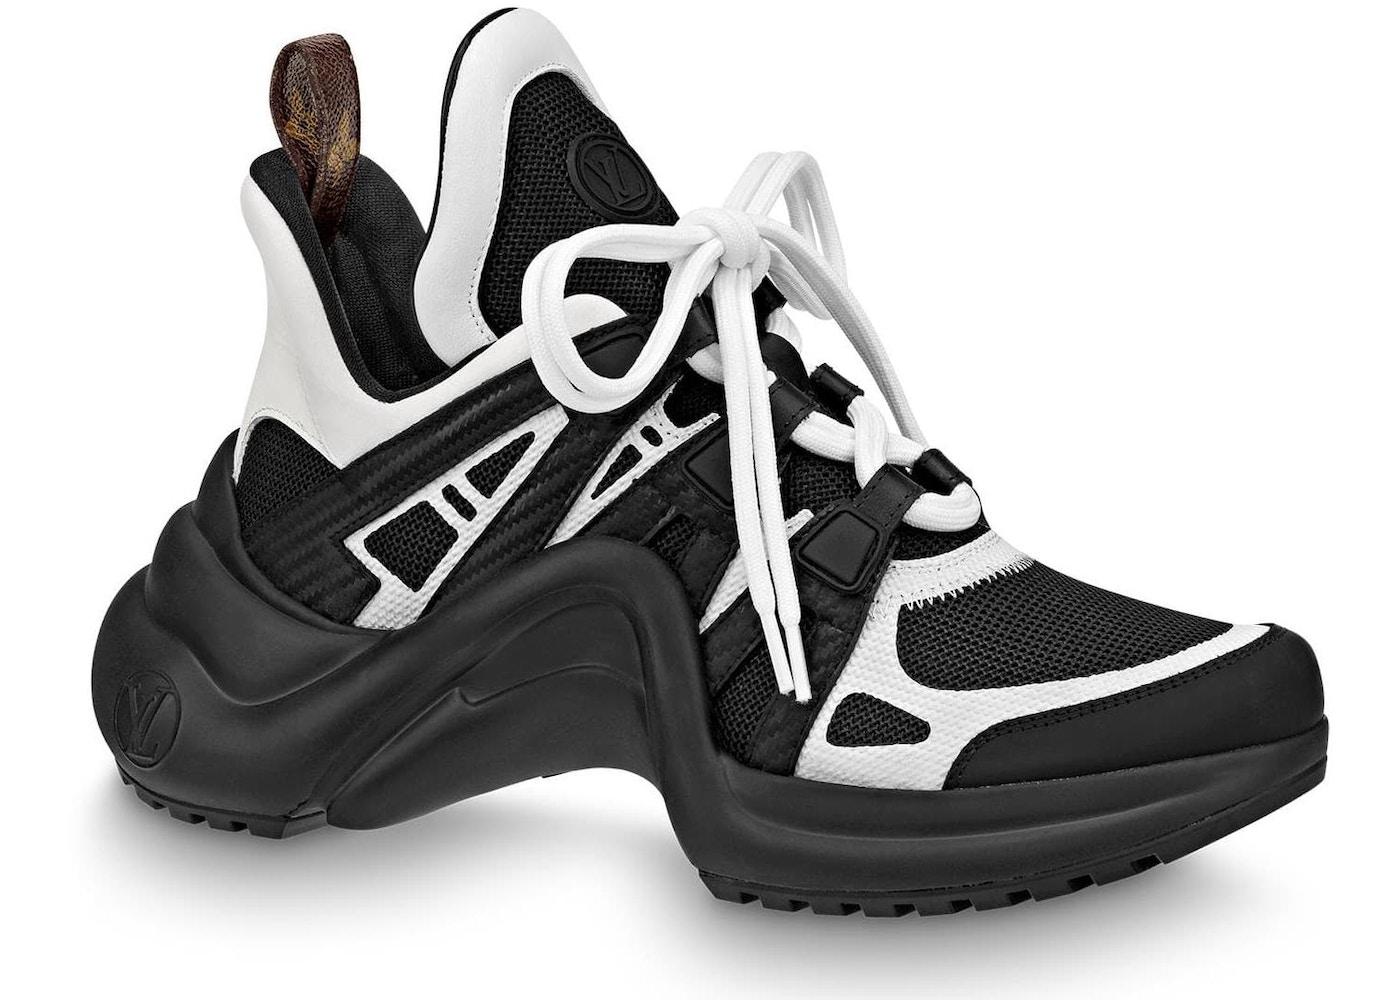 6e785f10e59 Buy Louis Vuitton Shoes & Deadstock Sneakers